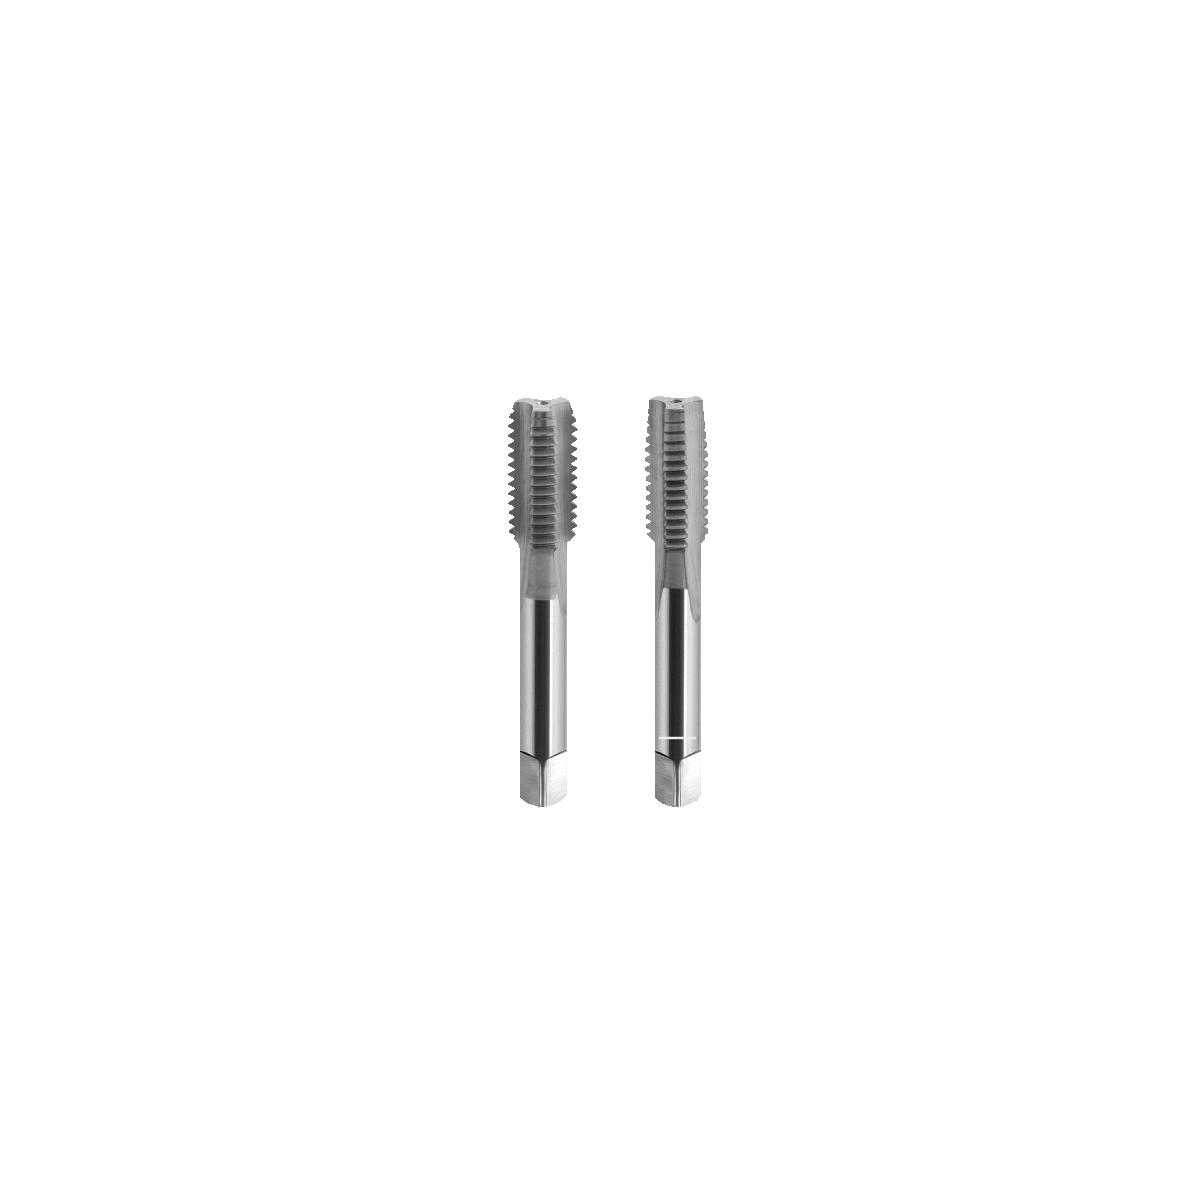 Gwintowniki M24 x 1.0 mm ISO-529/2 HSS - FANAR Gwintowniki M24 x 1.0 mm ISO-529/2 HSS - FANAR